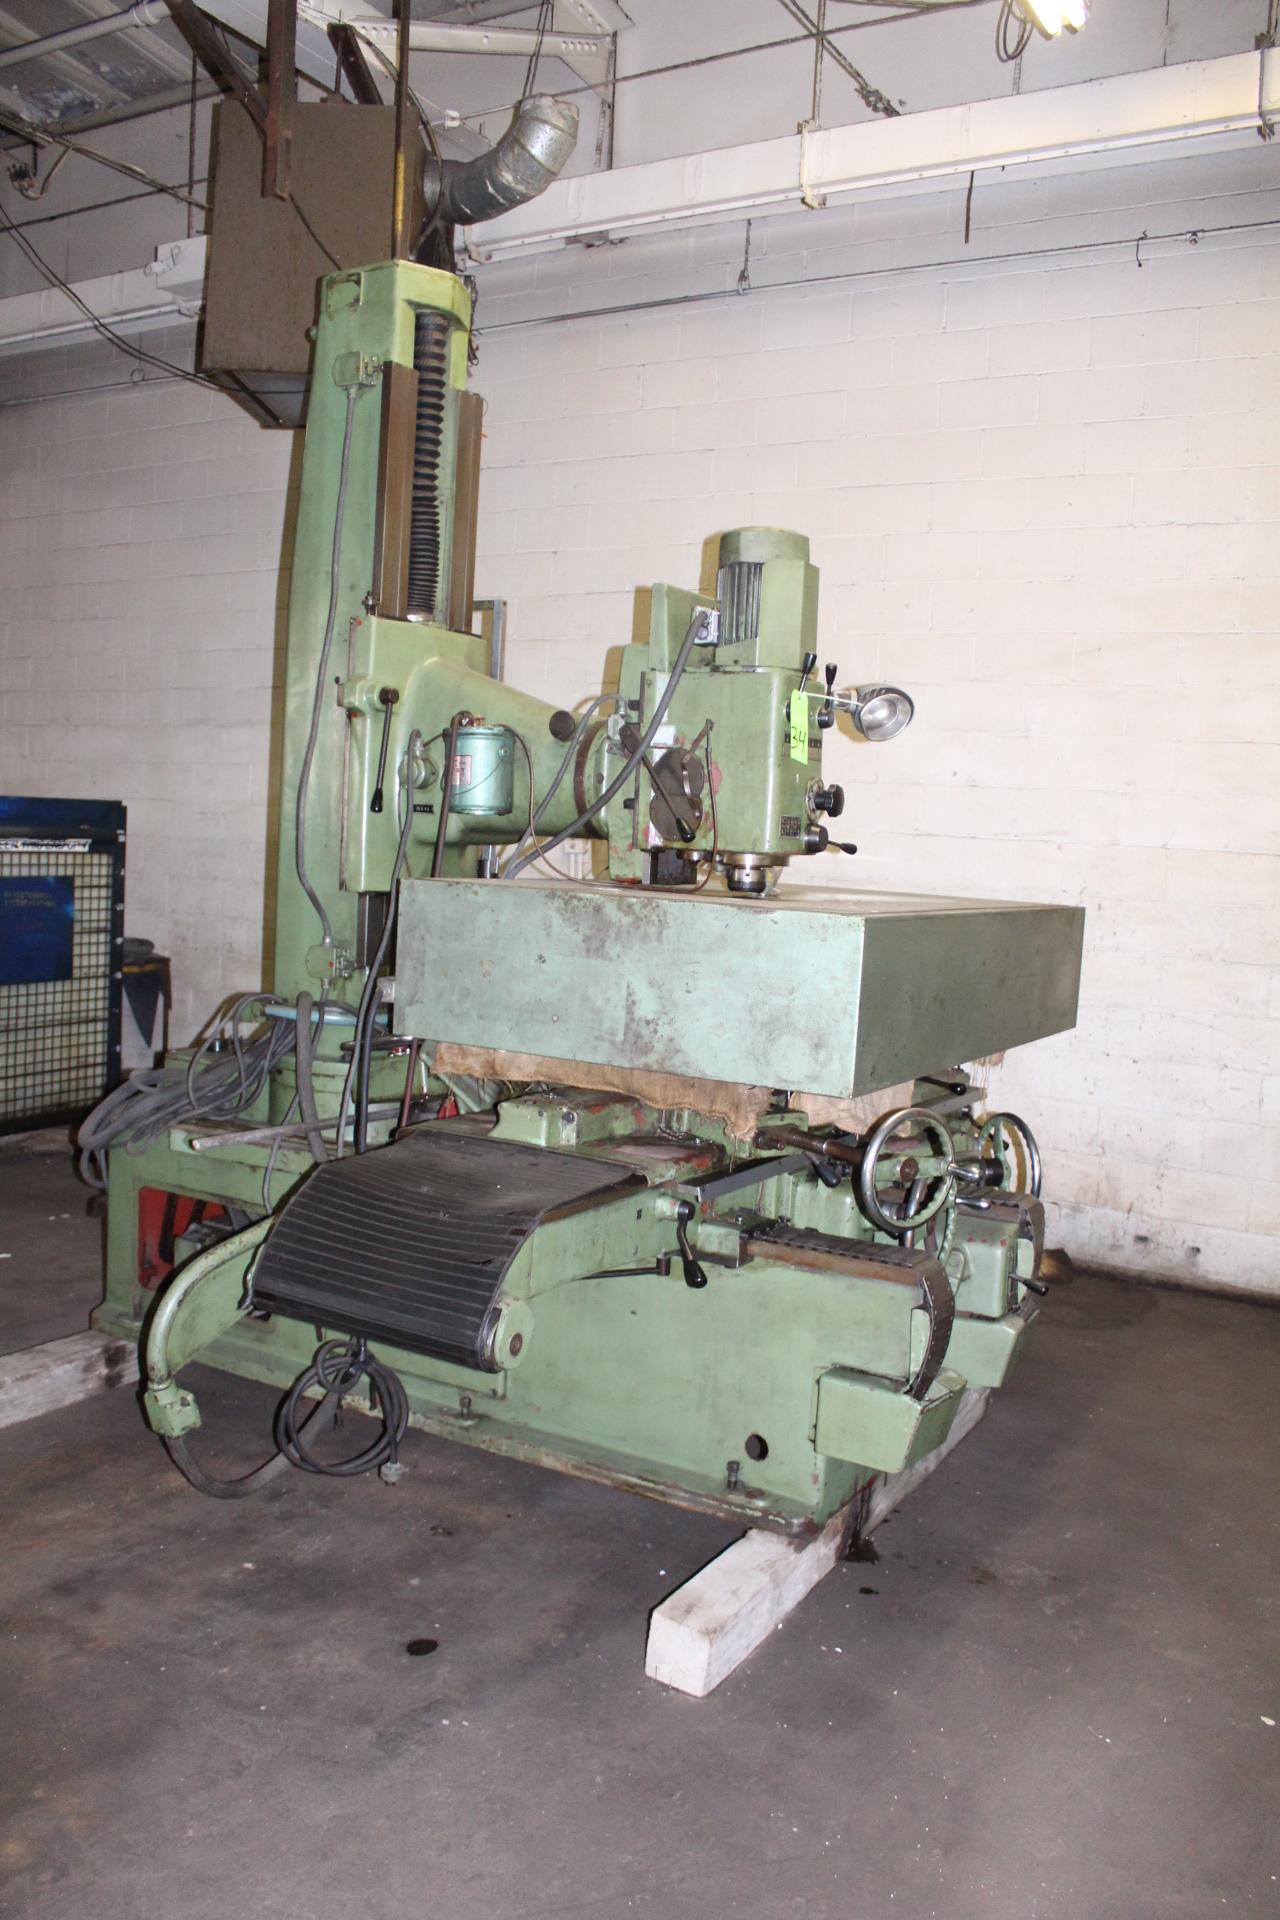 Lot 34 - Zimmerman FZ4 Universal Head Pattern Milling Machine